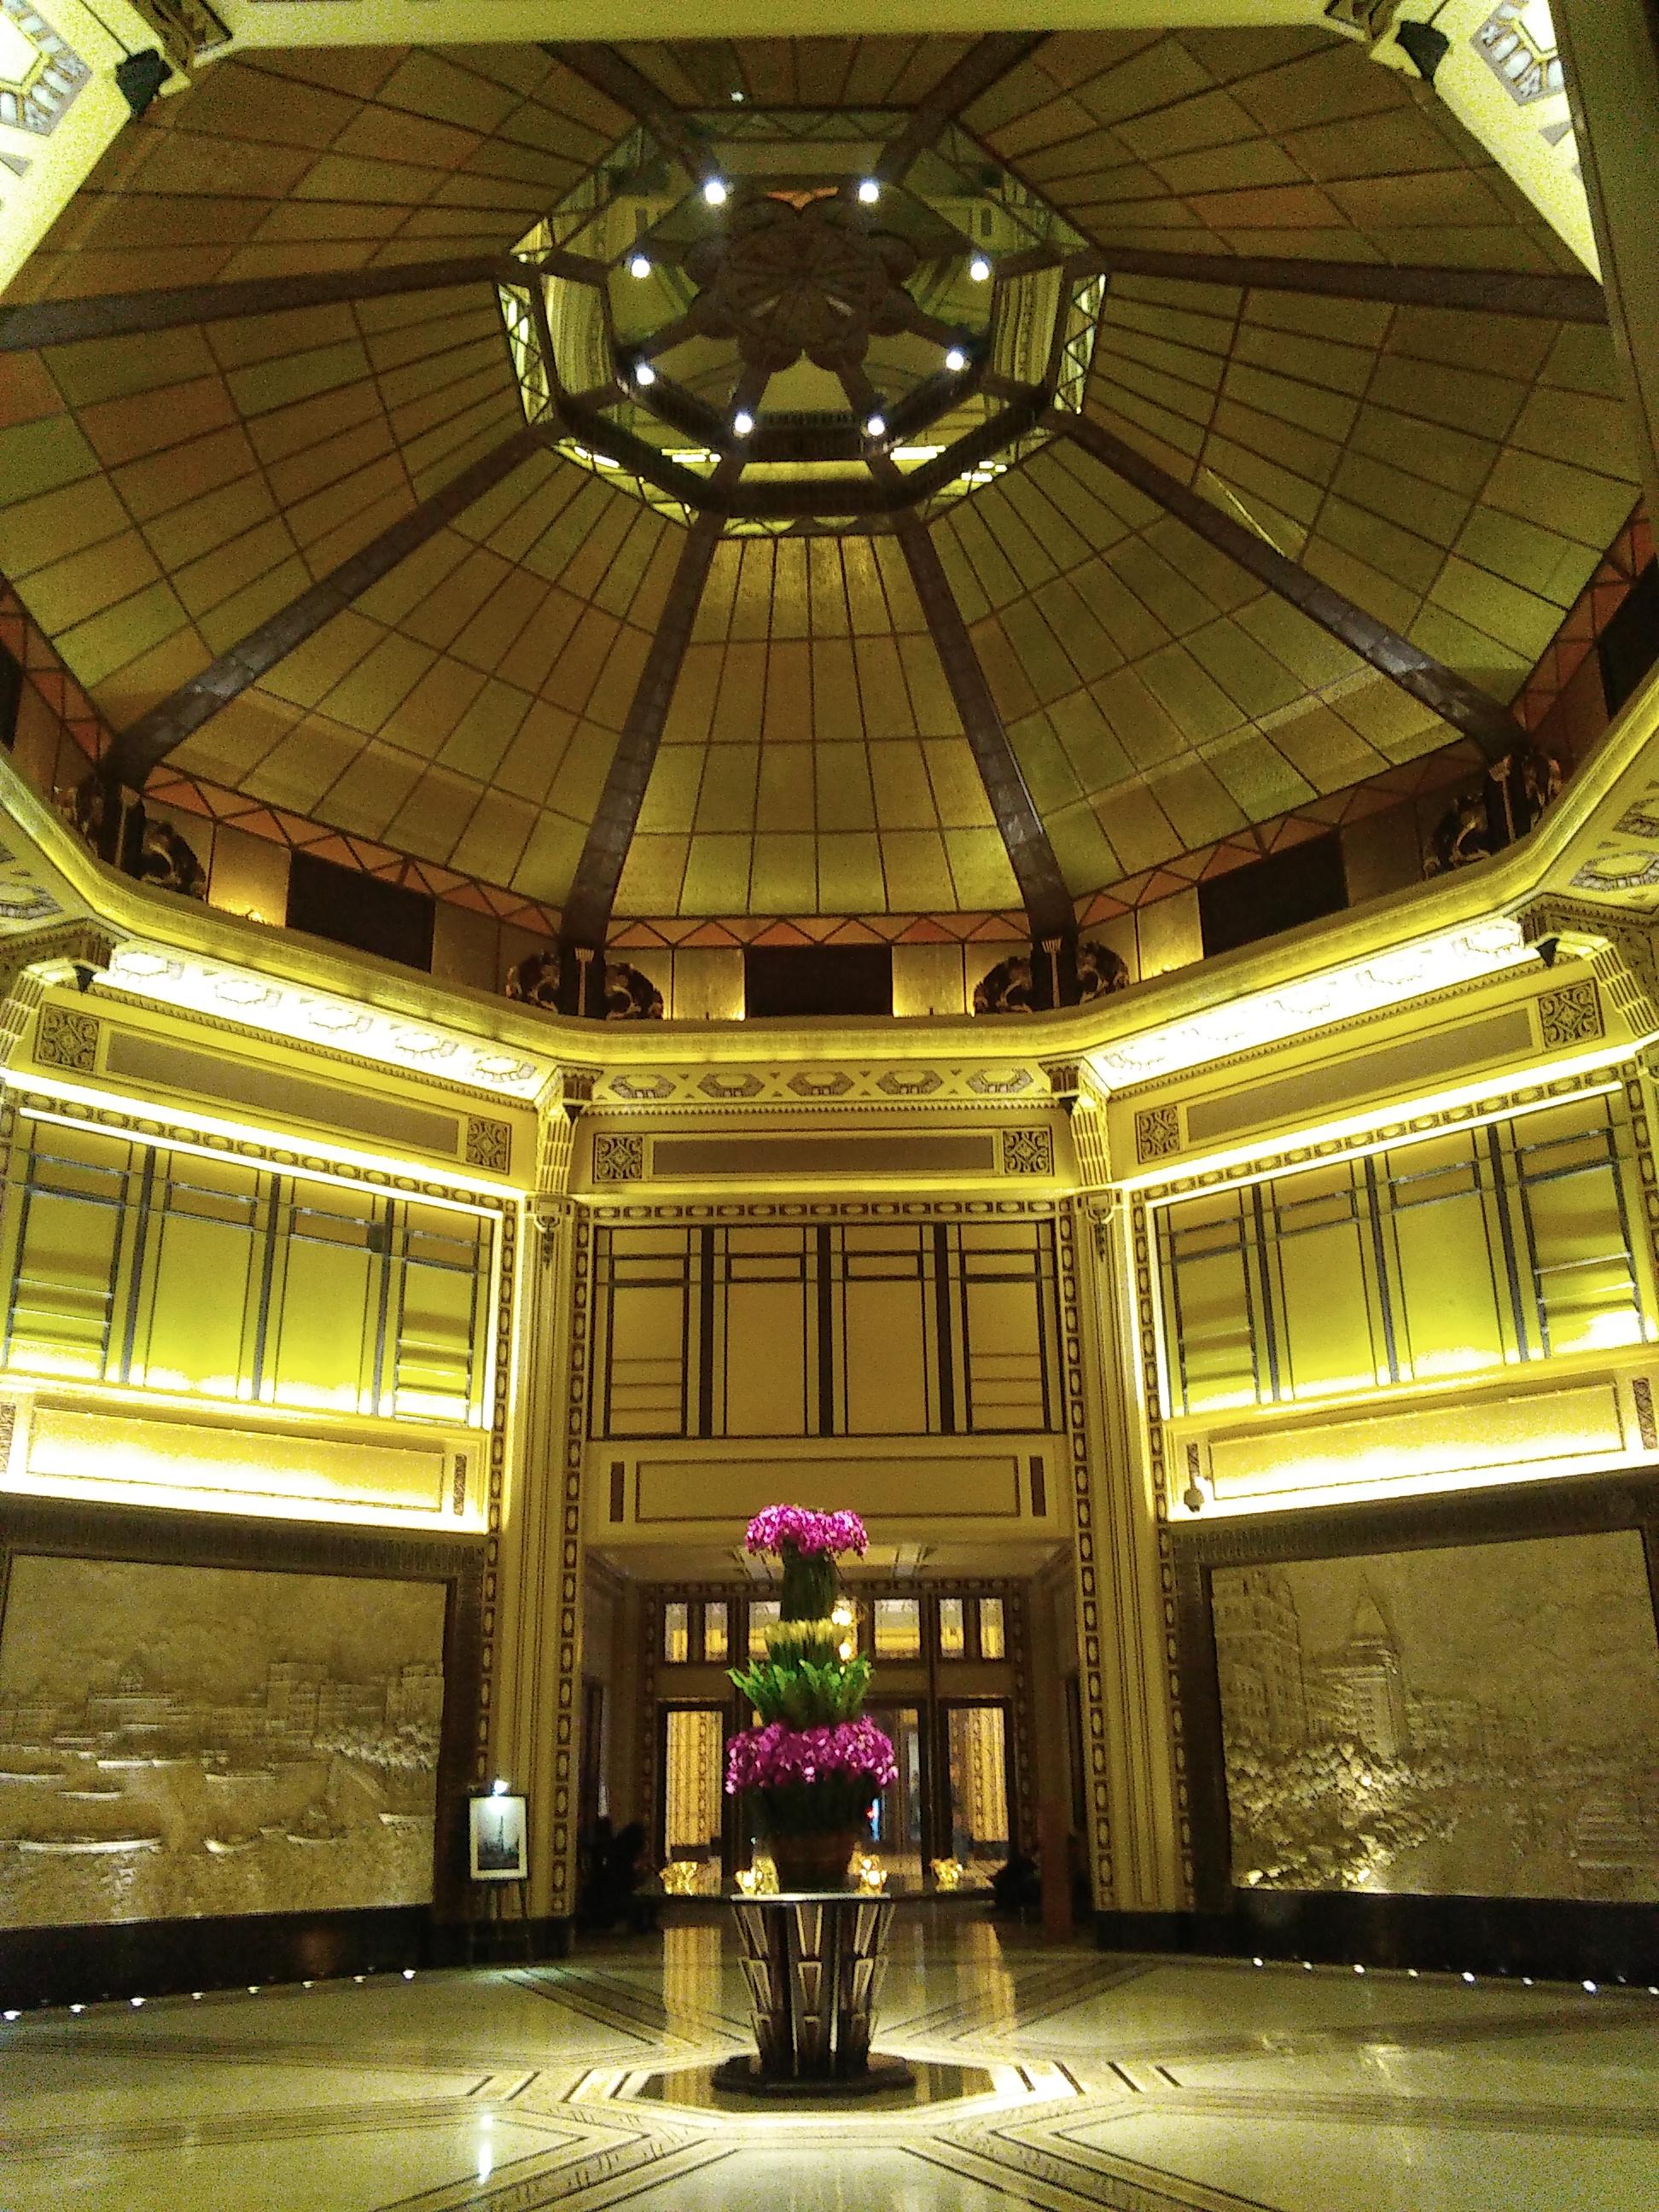 Jazz floats down the main hallway of the Peace Hotel like a fading memory of a bygone era.   如那渐渐消失的昔日岁月,爵士音乐的气氛也在和平酒店的大堂里缓缓地飘动着 。